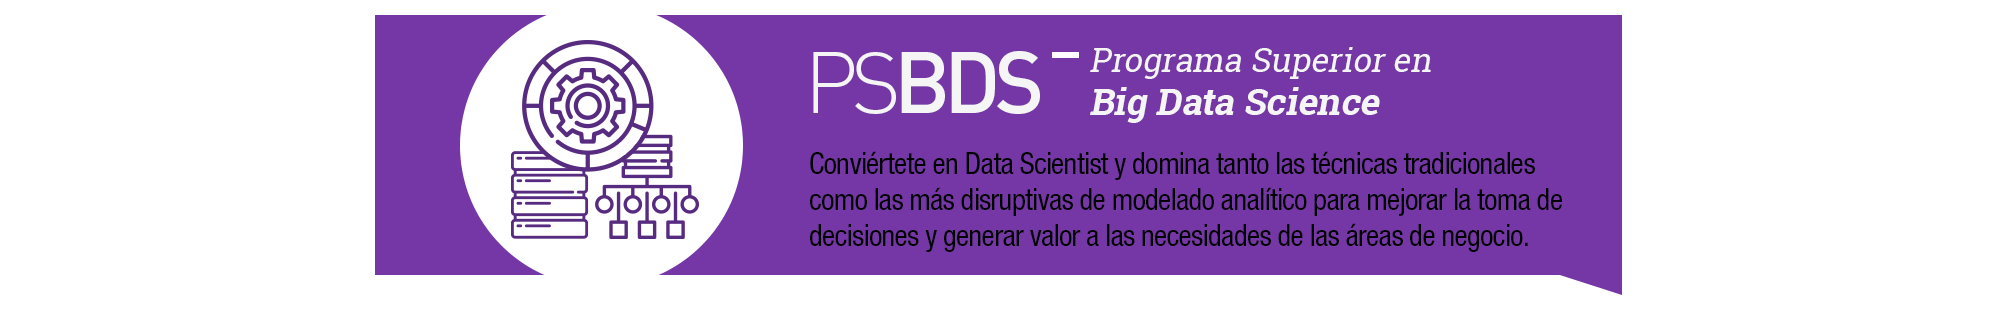 Imagen_slider_programa_superior_big_data_science